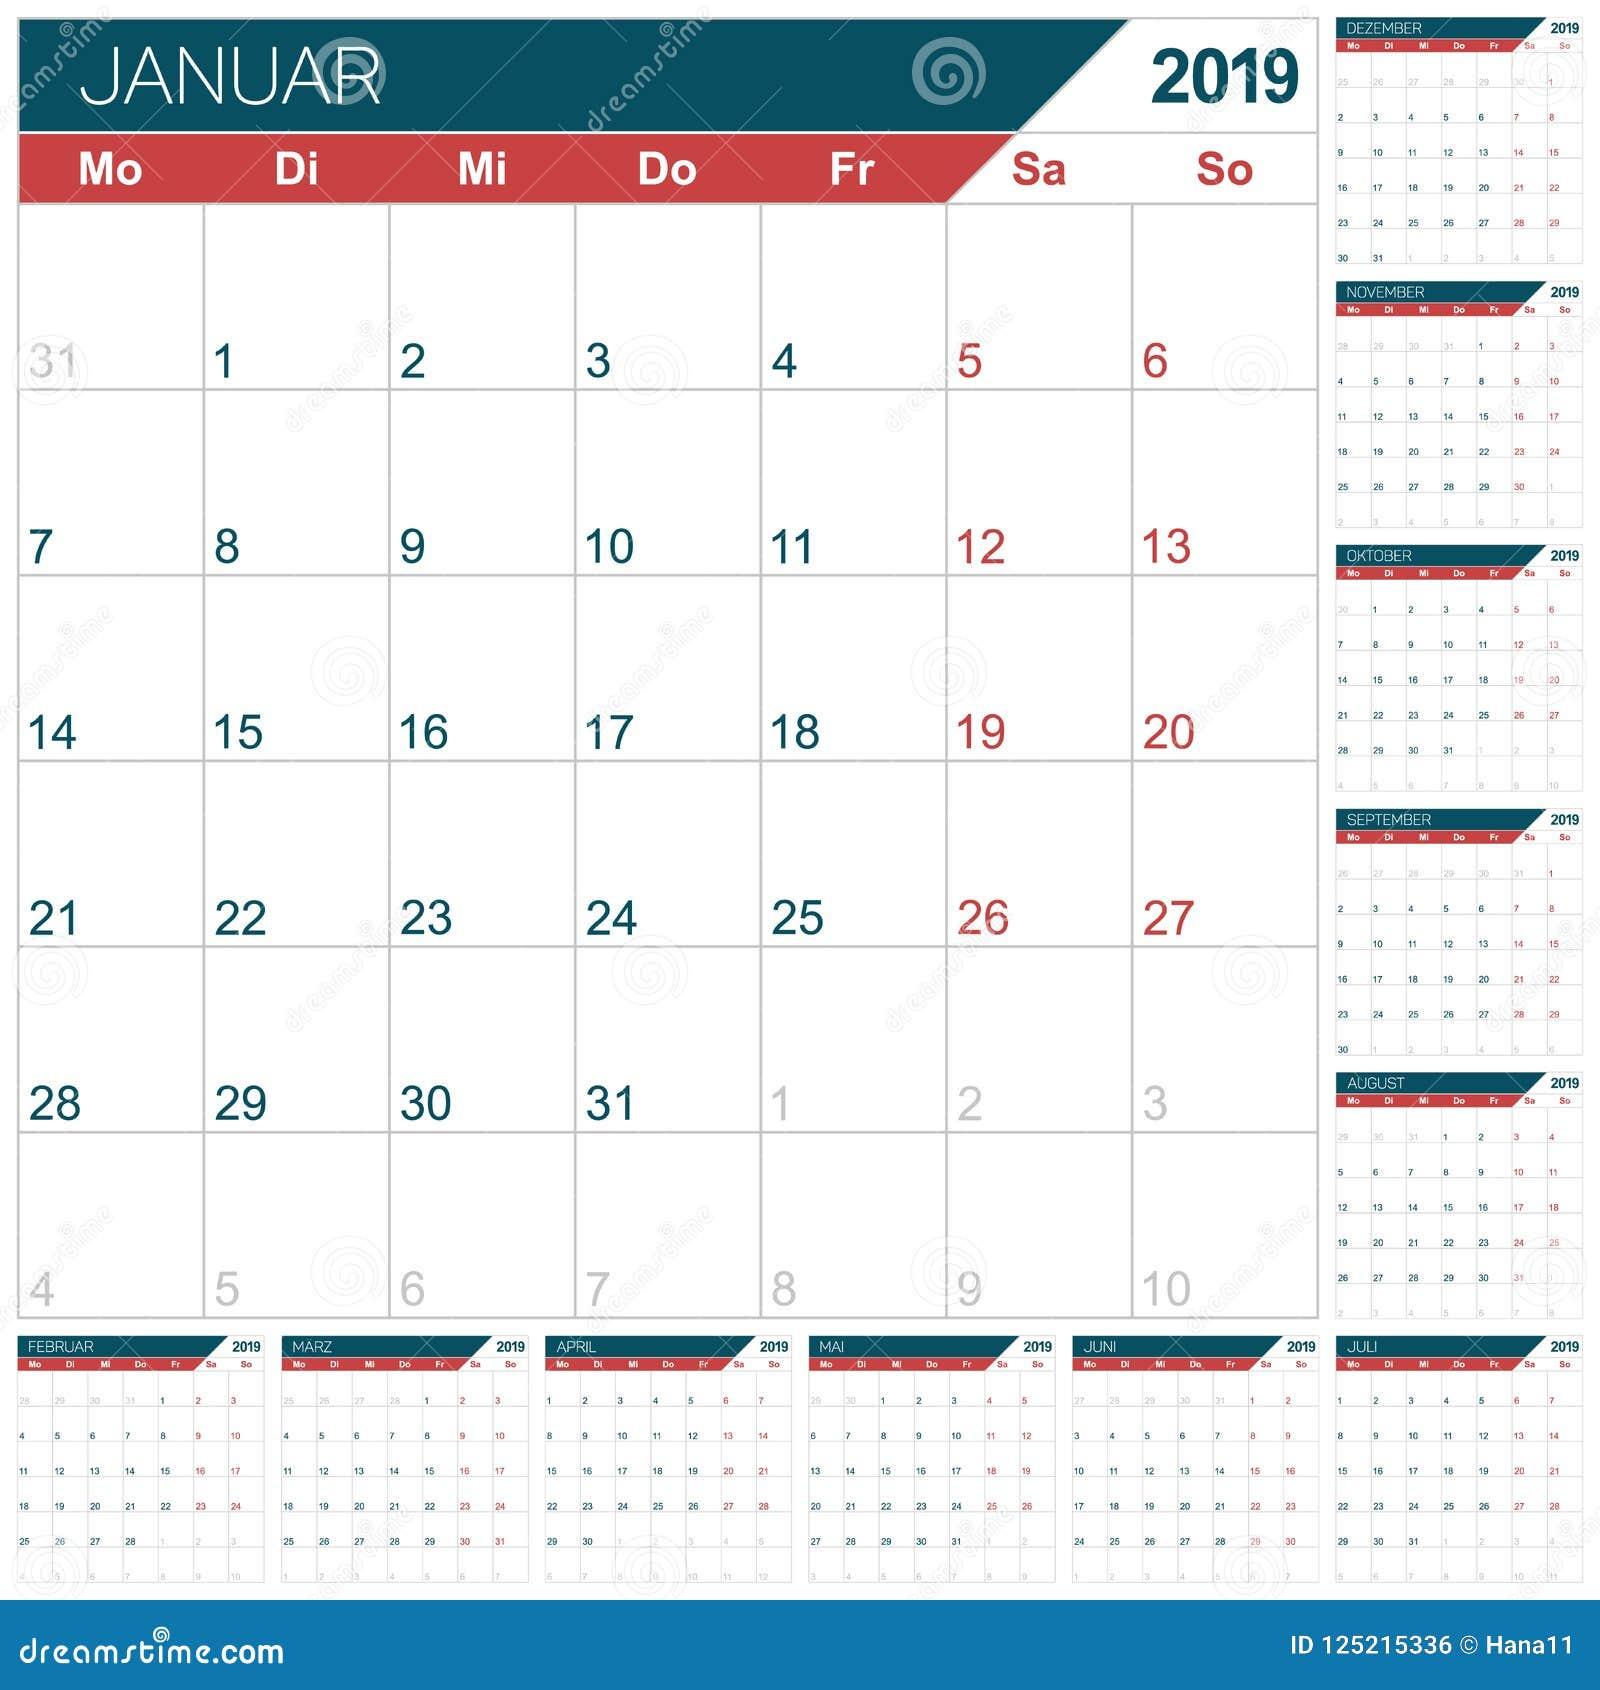 Calendario tedesco per l anno 2019